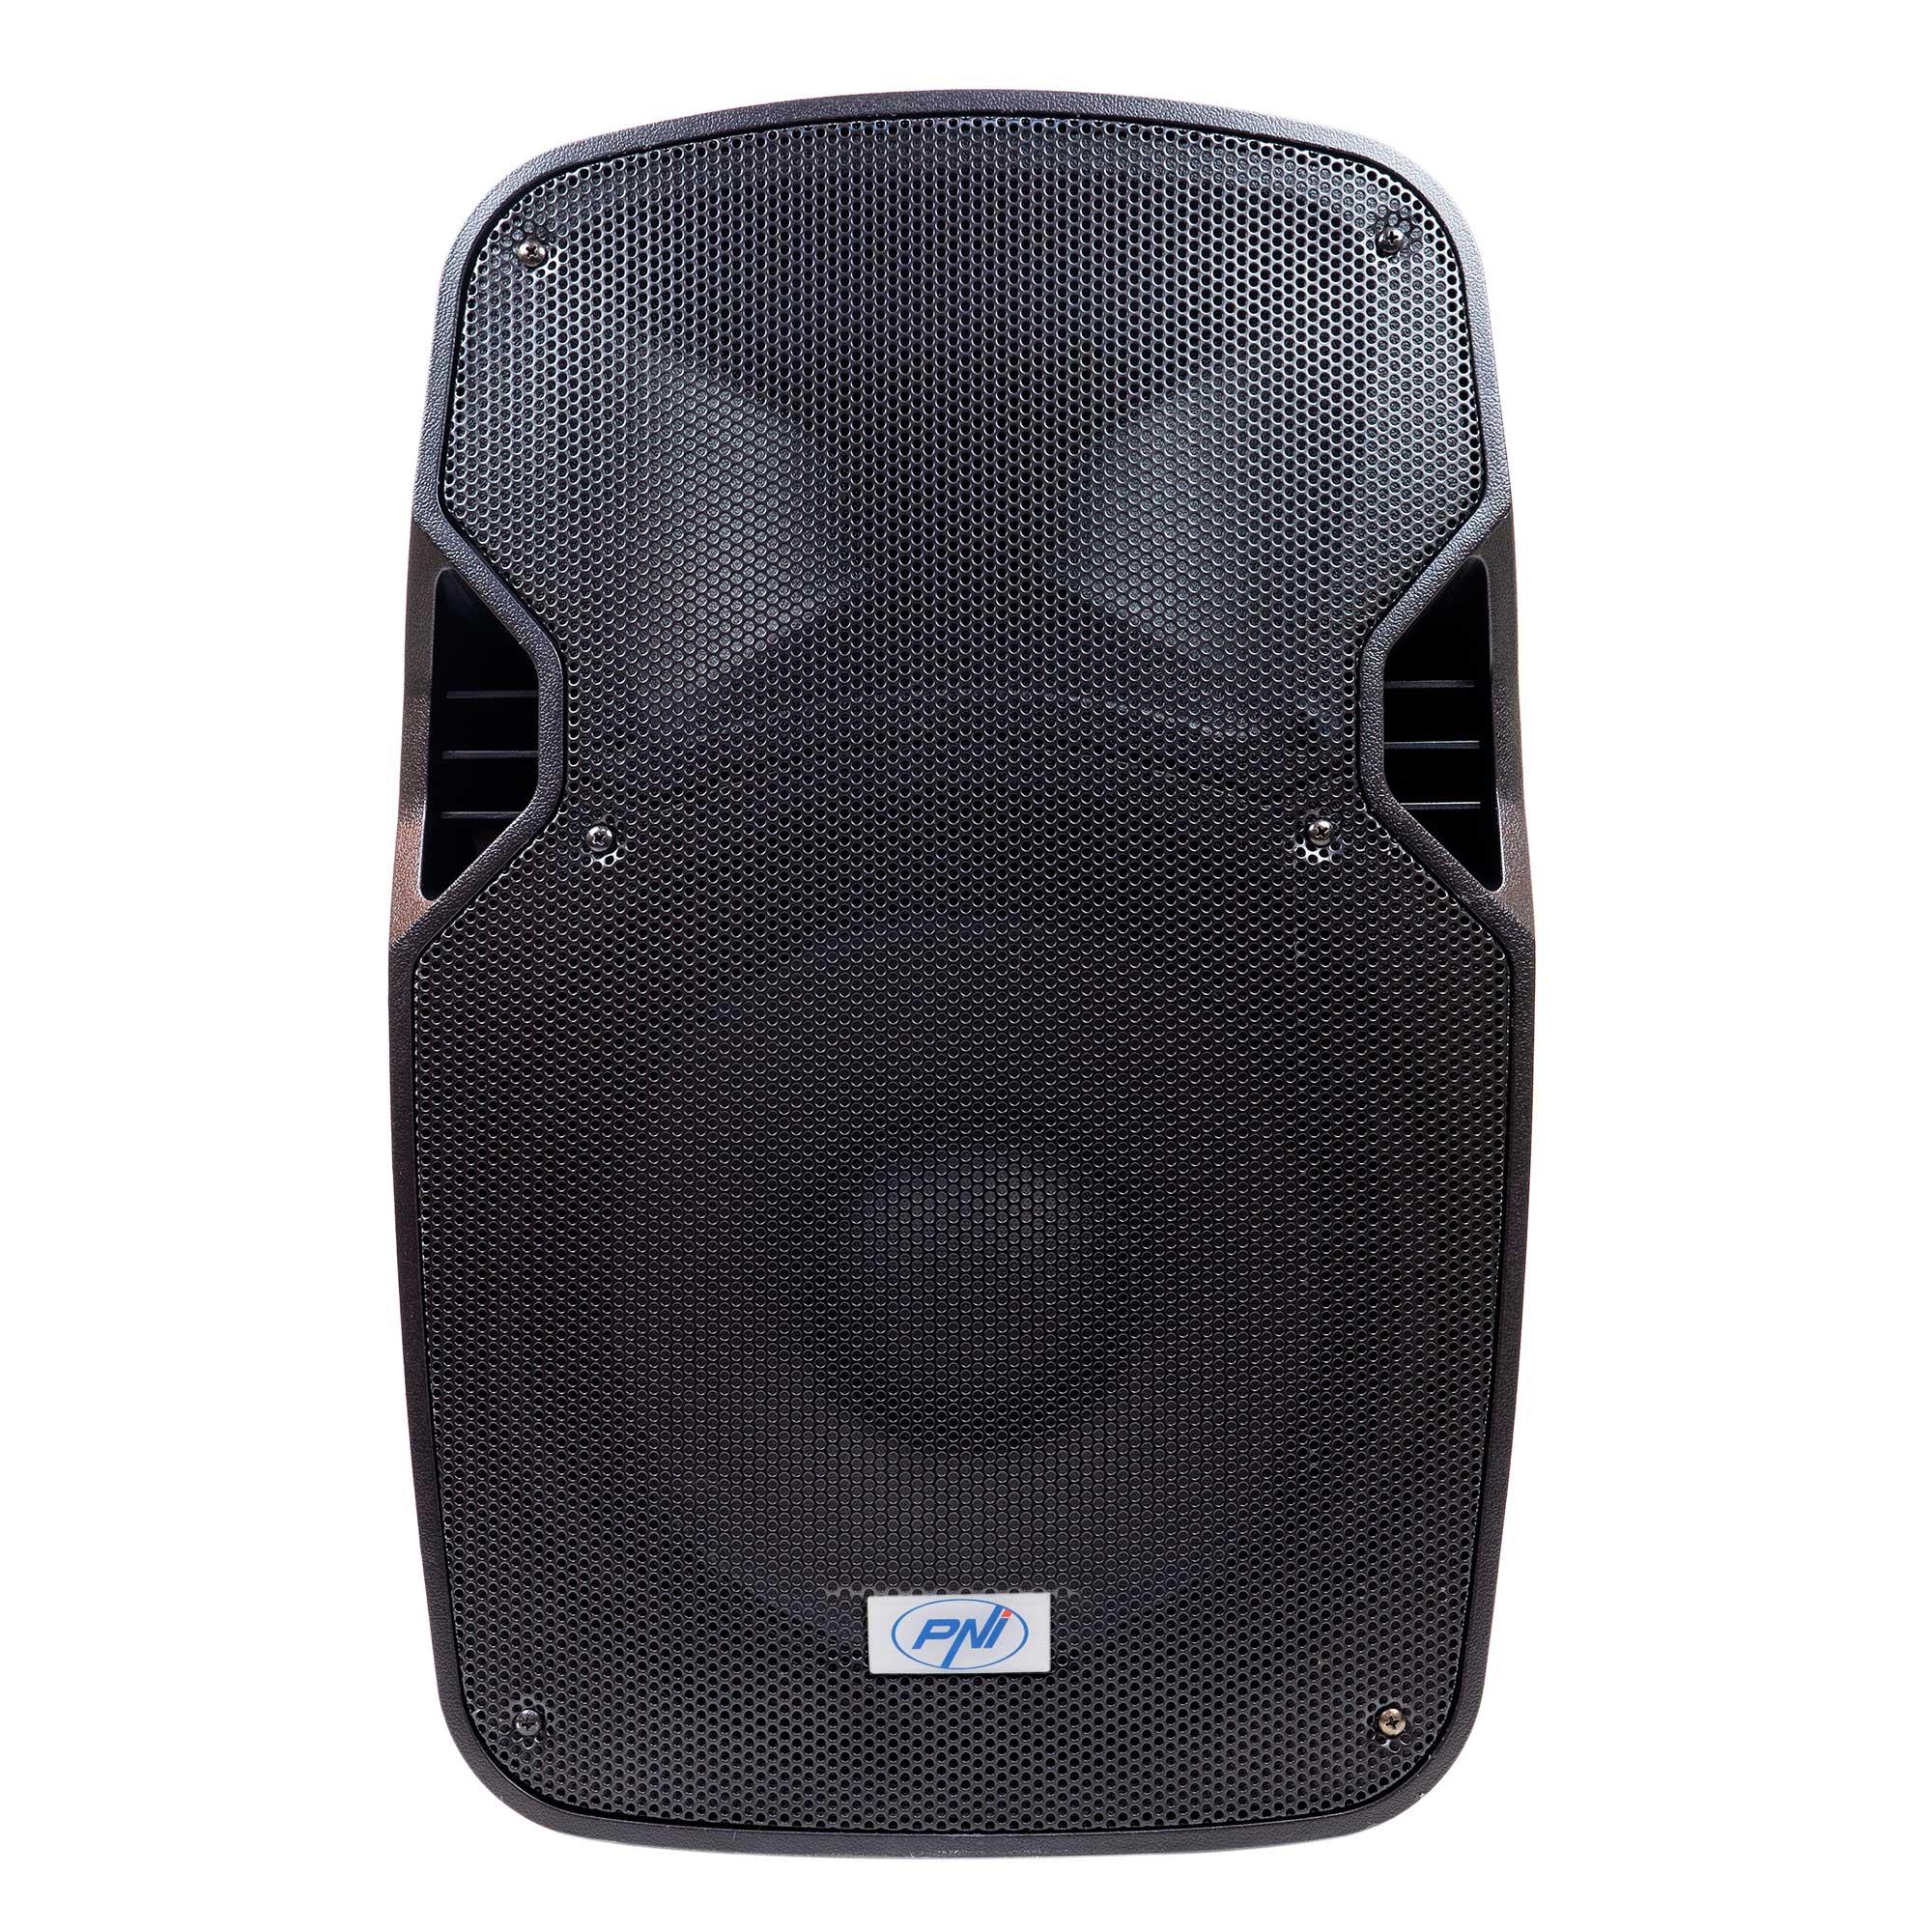 Fotografie Boxa portabila PNI FunBox BT1800, RMS 180W, woofer 12 inch, cu Bluetooth, MP3 player, SD, USB, radio FM, karaoke, functie Echo si 2 microfoane UHF incluse